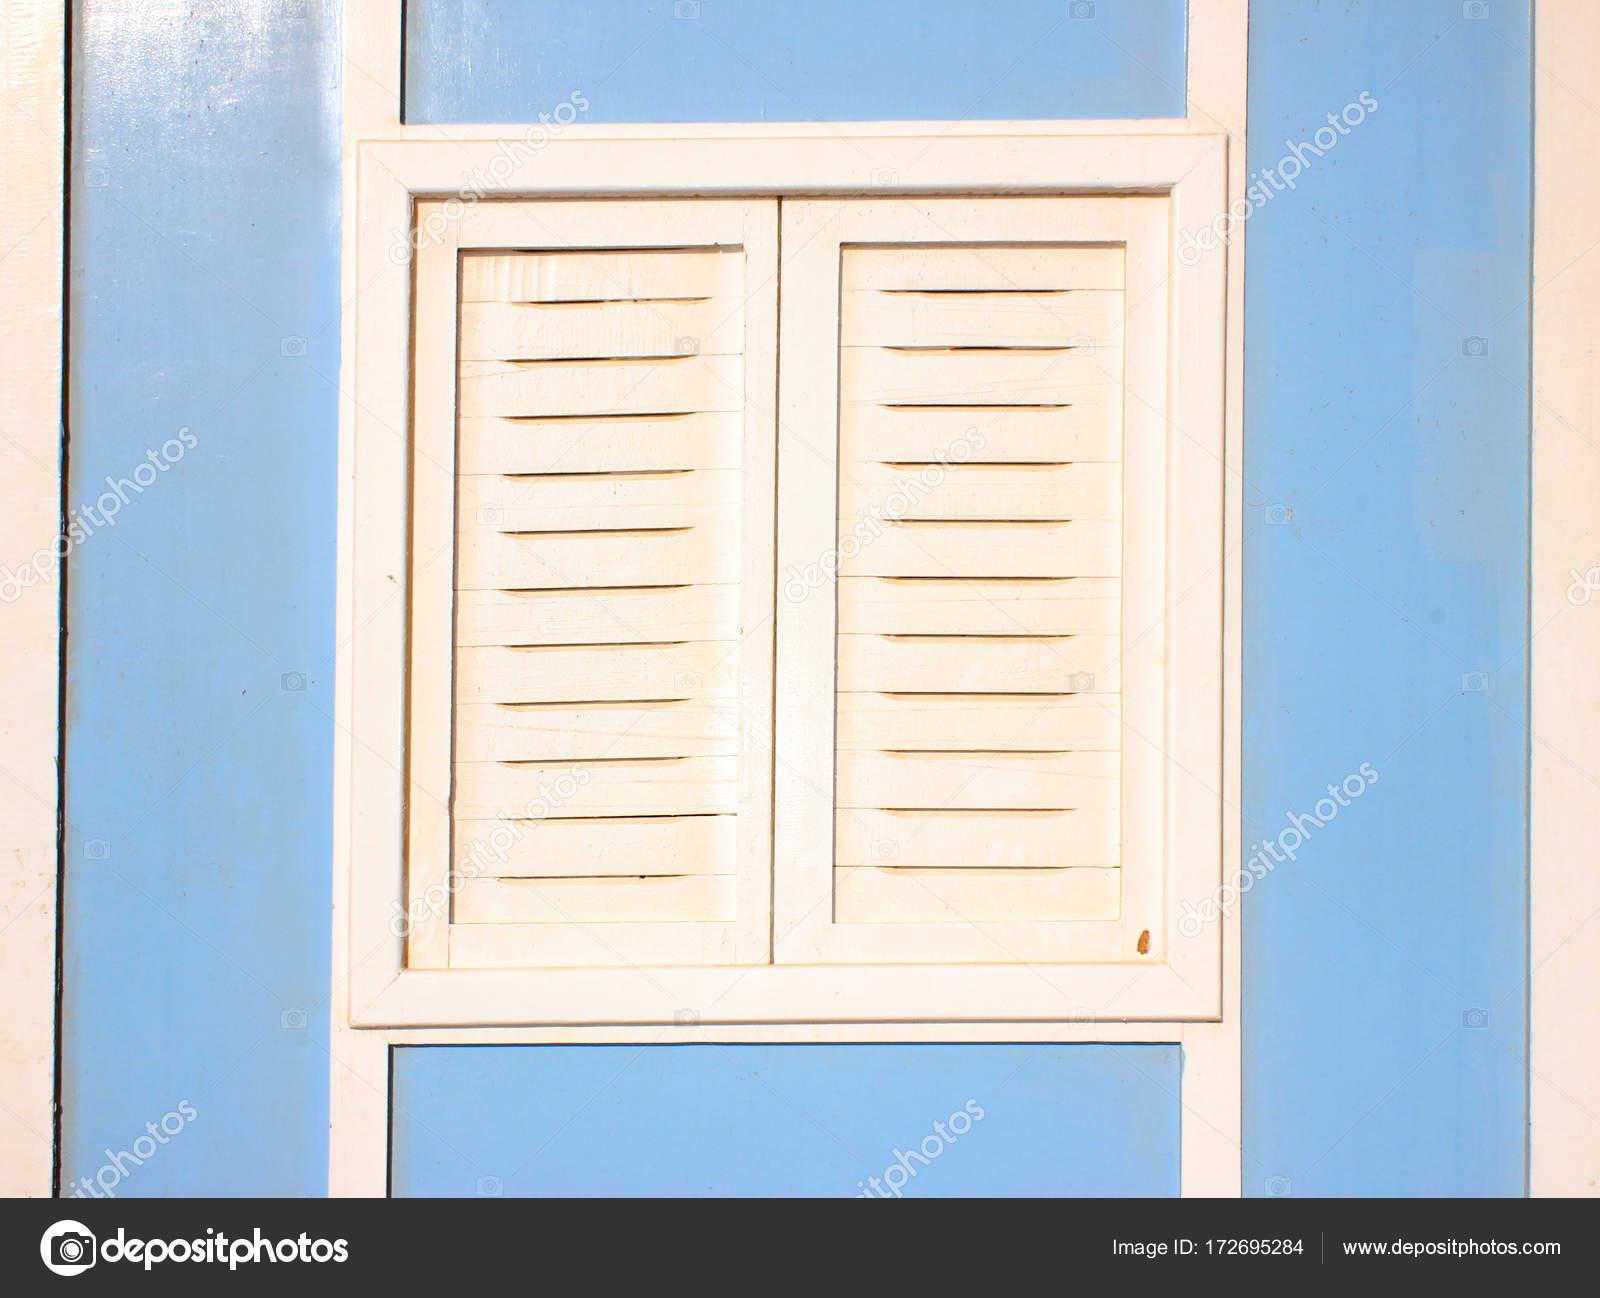 Alte Vintage Holz-Fenster schließen — Stockfoto © valeo6 #172695284